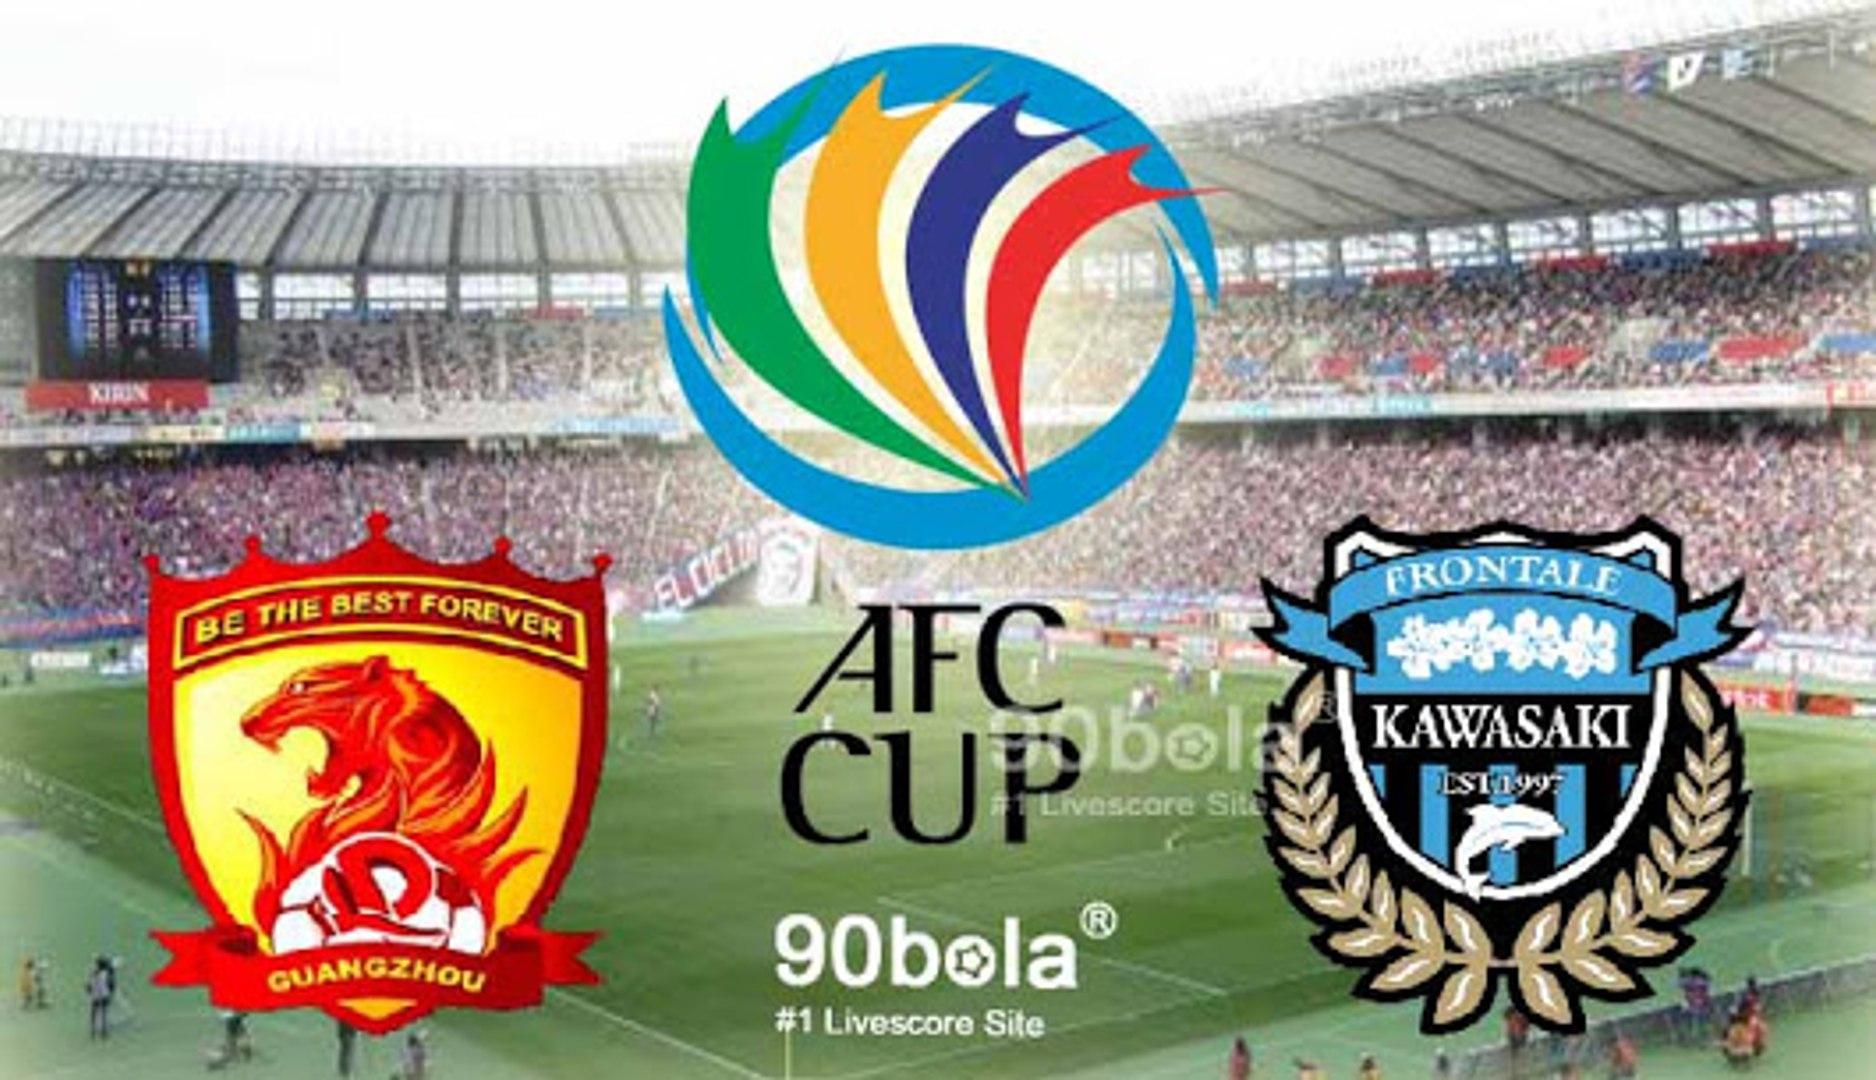 Guangzhou Evergrande vs Kawasaki Frontale 1-1 • All Goals & Highlights HD -  video Dailymotion